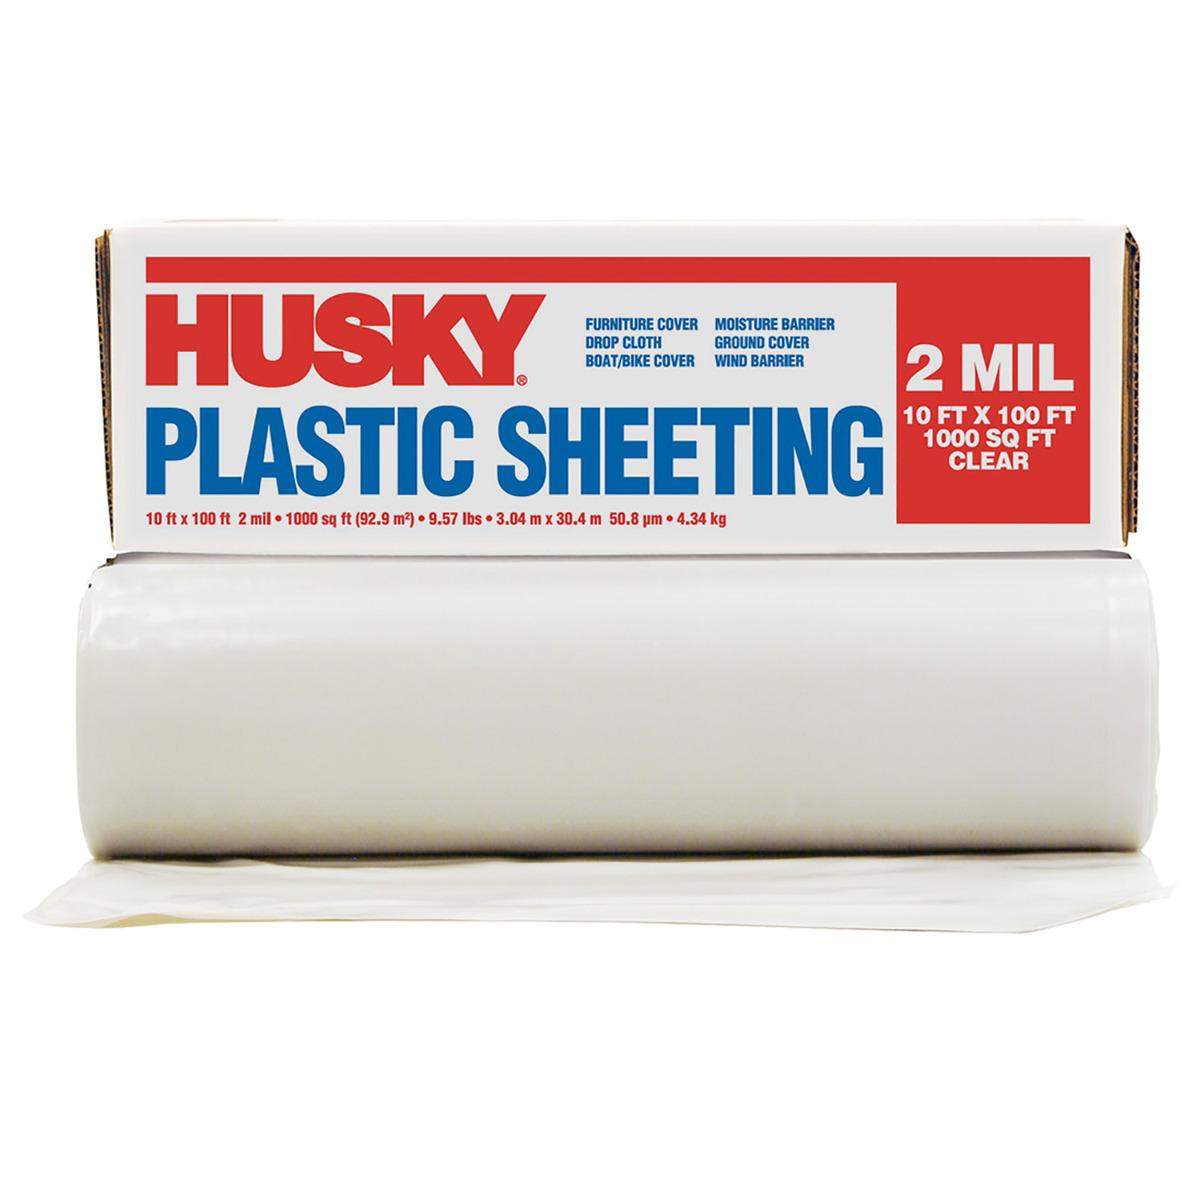 Airgas poly america 10 x 100 clear 2 mil polyethylene husky plastic sheeting publicscrutiny Gallery